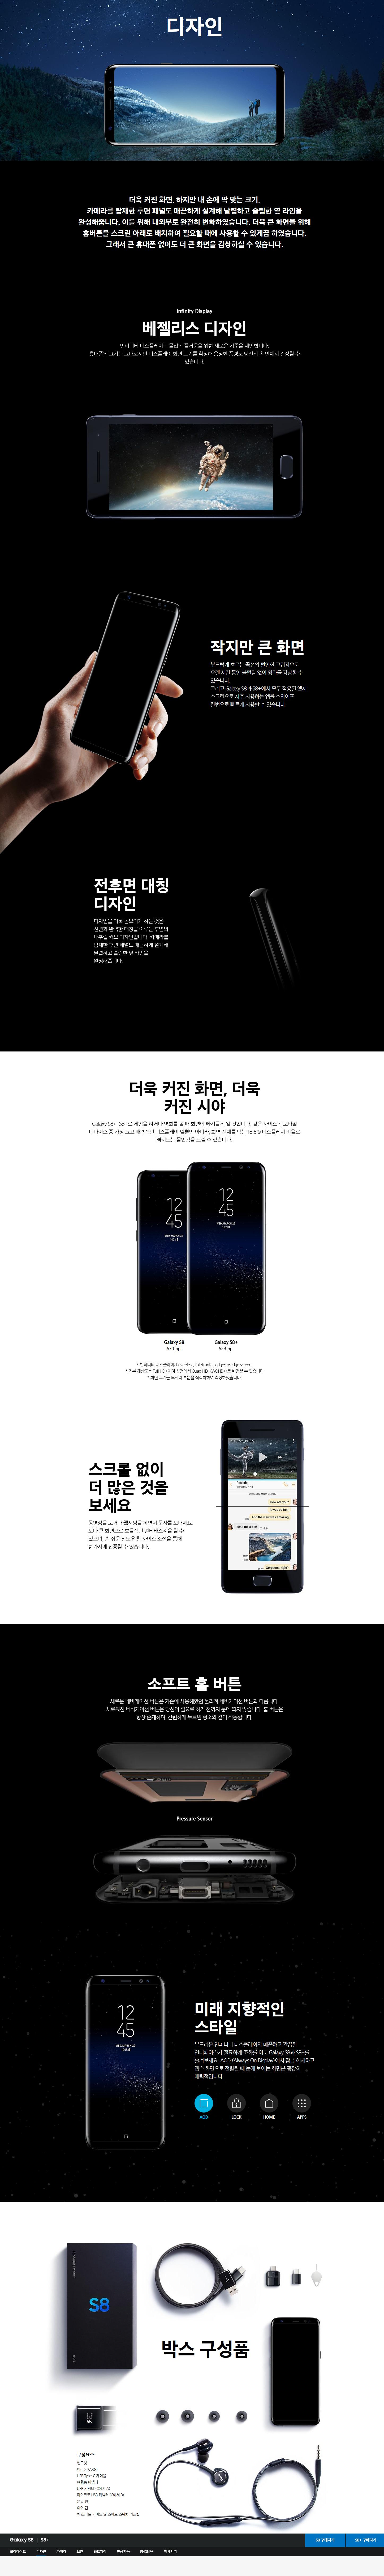 Screenshot_2018-12-30 디자인 - Infinity Display Samsung Galaxy S8, S8+.jpg